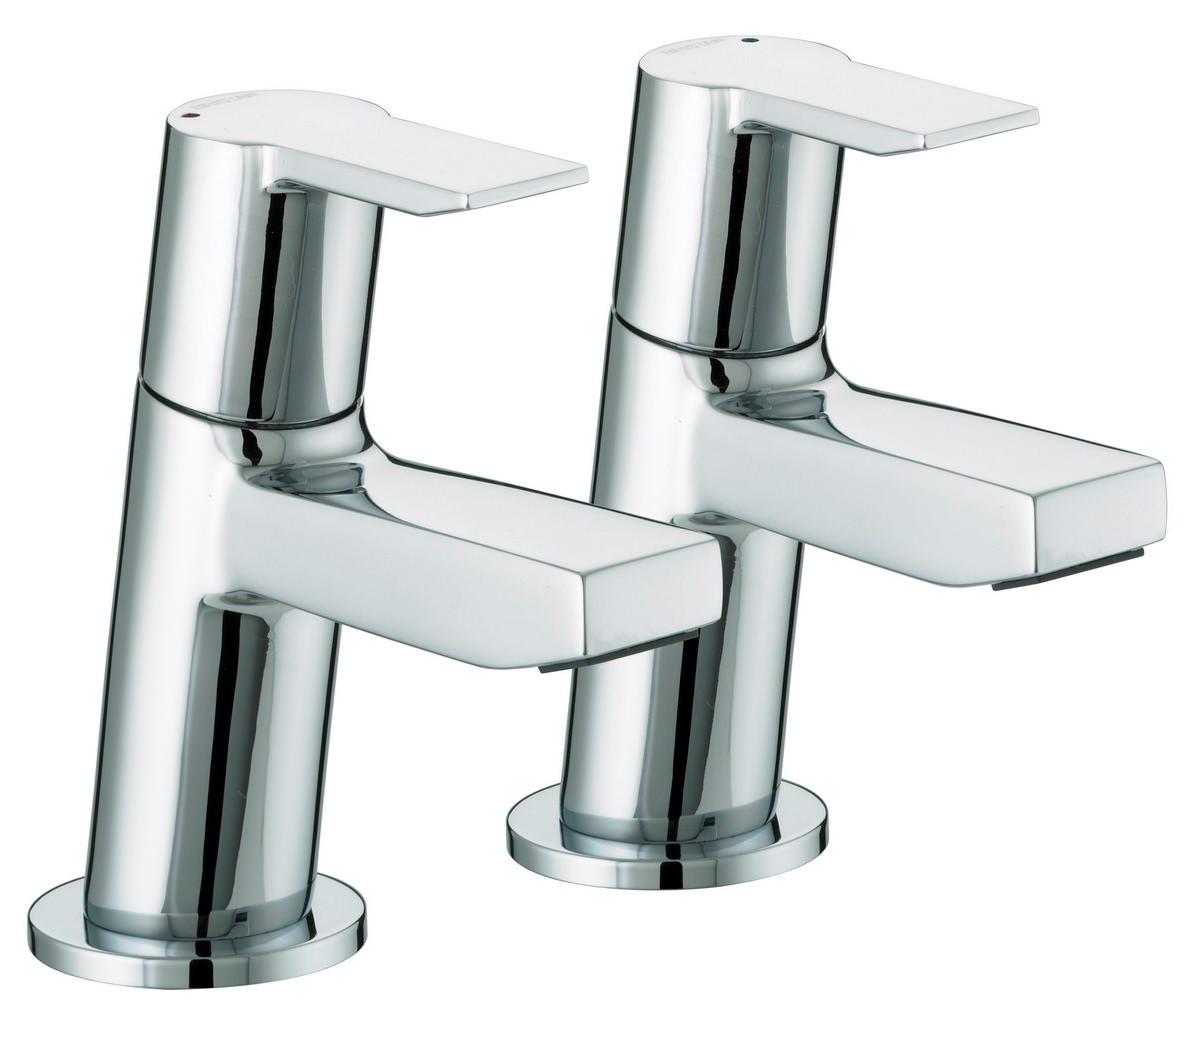 bristan pisa basin taps ps 1 2 c. Black Bedroom Furniture Sets. Home Design Ideas